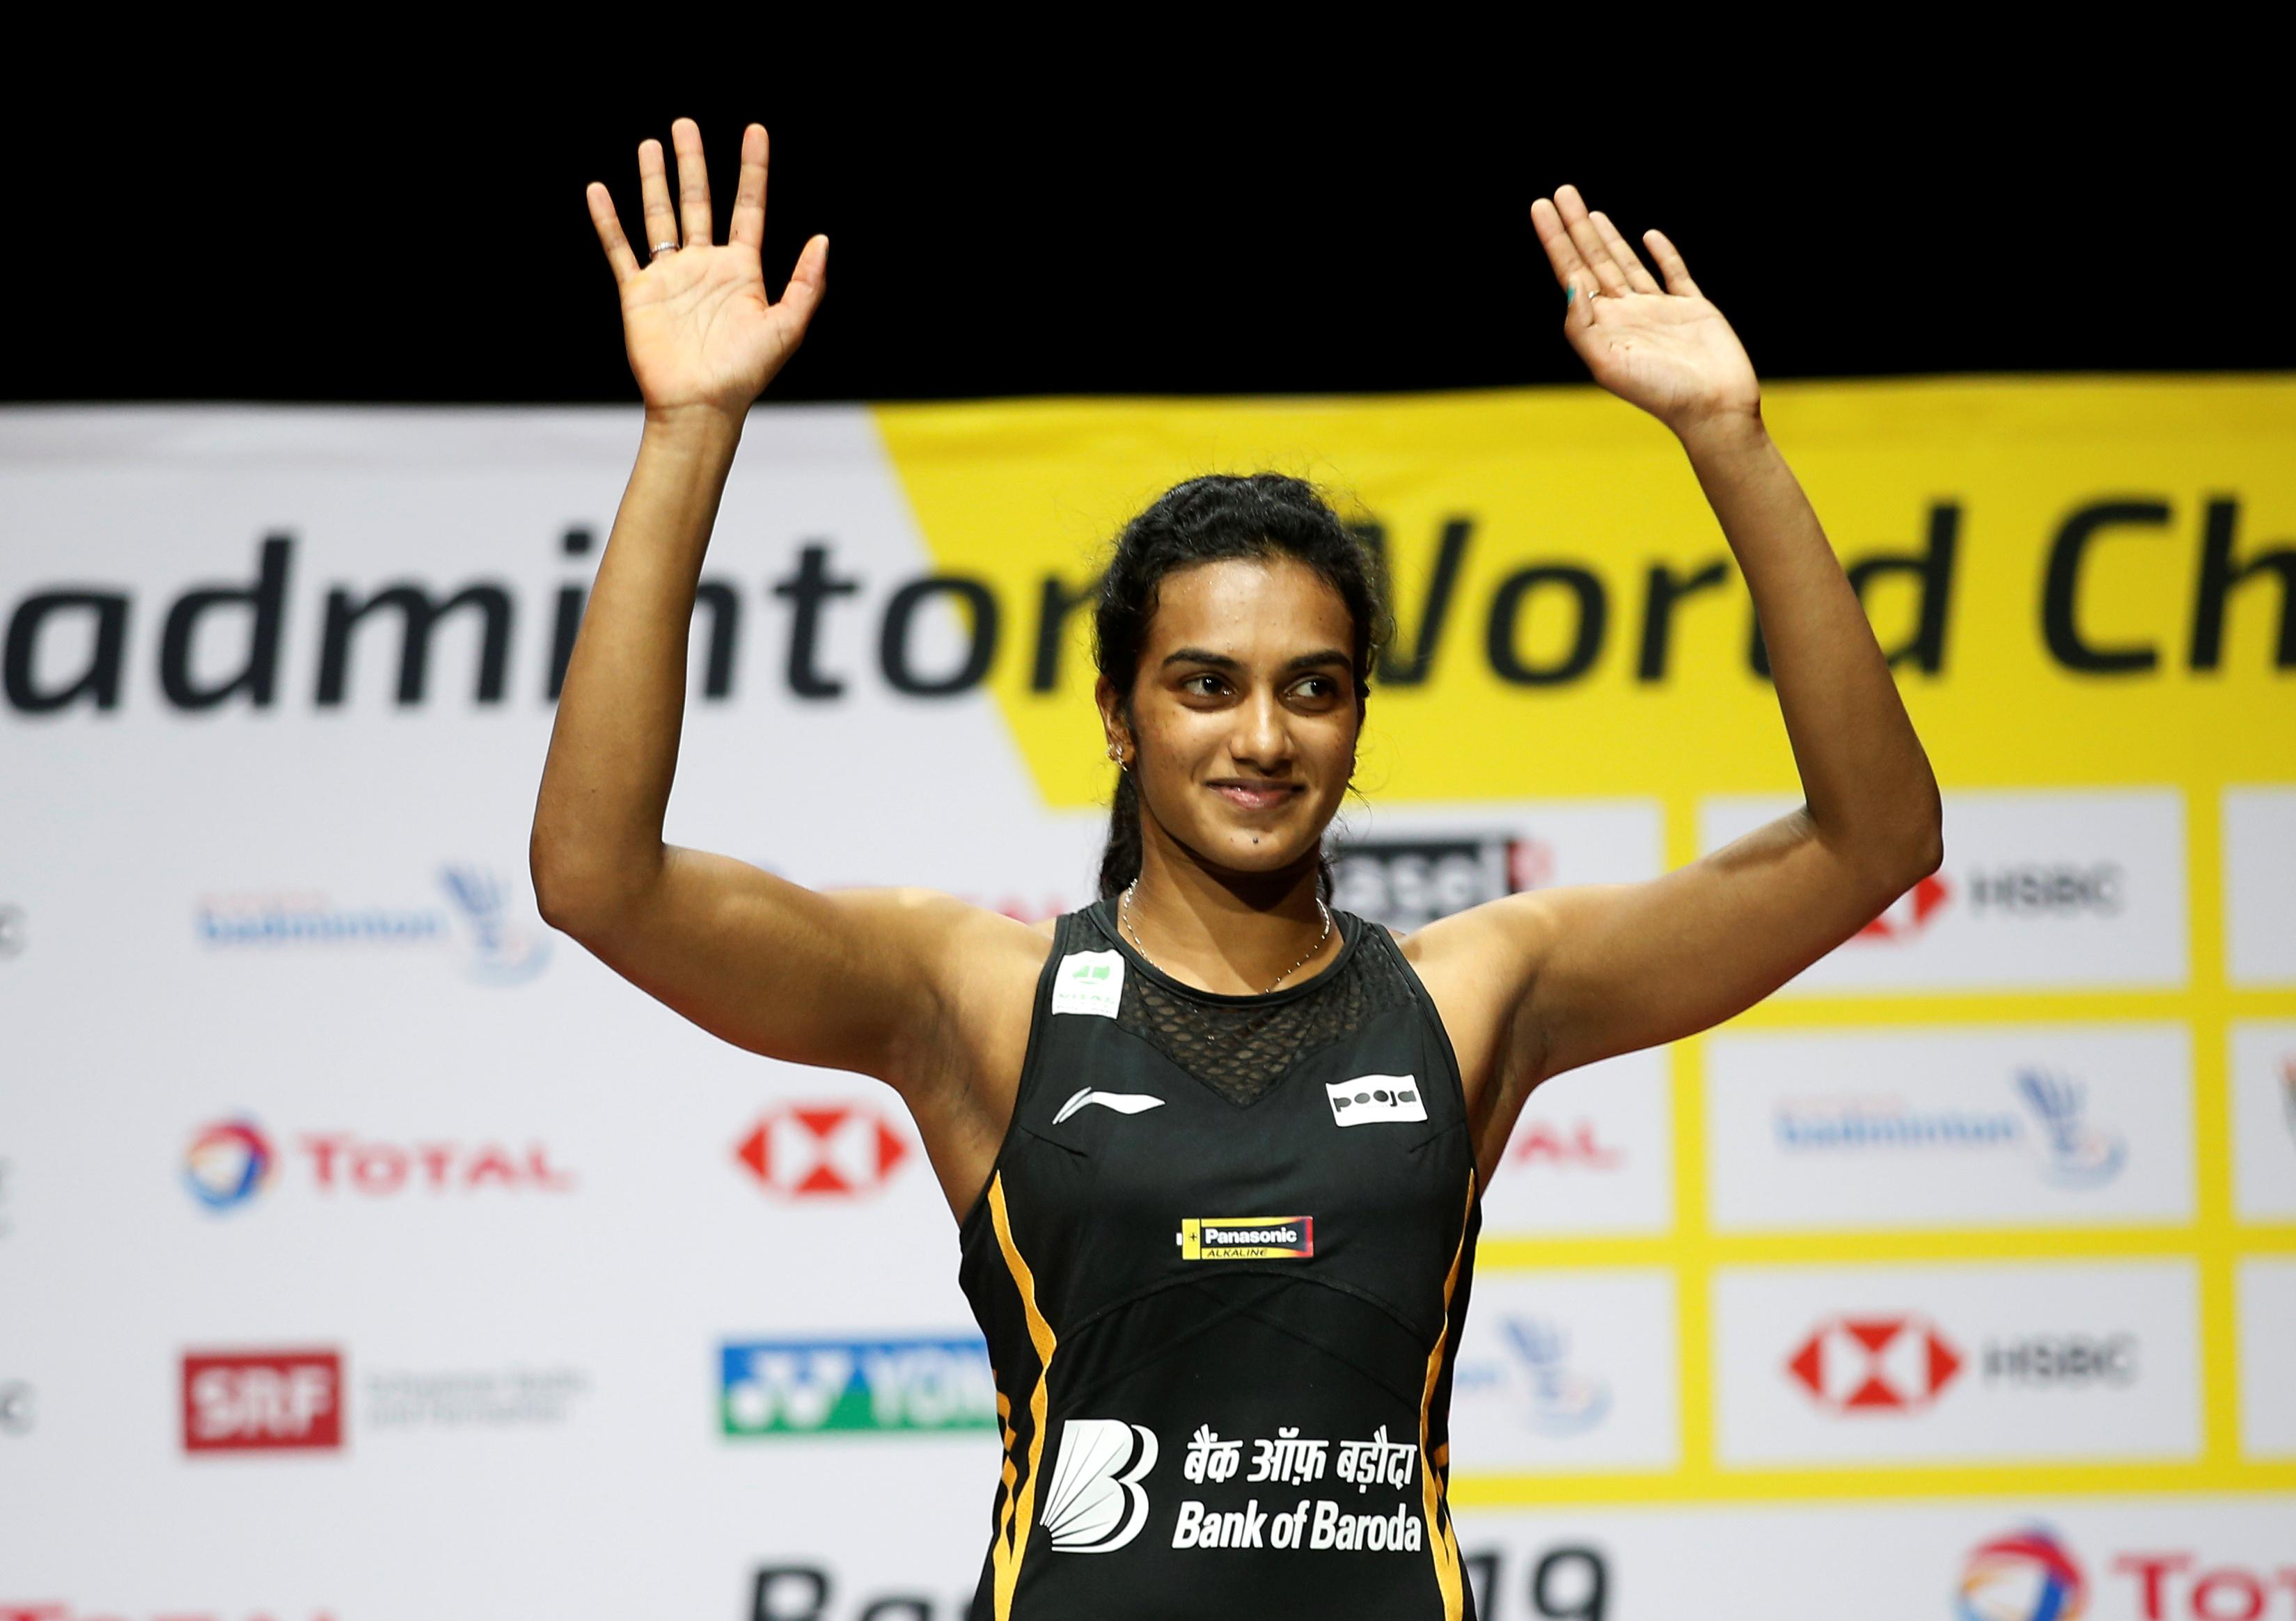 Badminton: 'Silver girl' no more, India's Sindhu aims higher